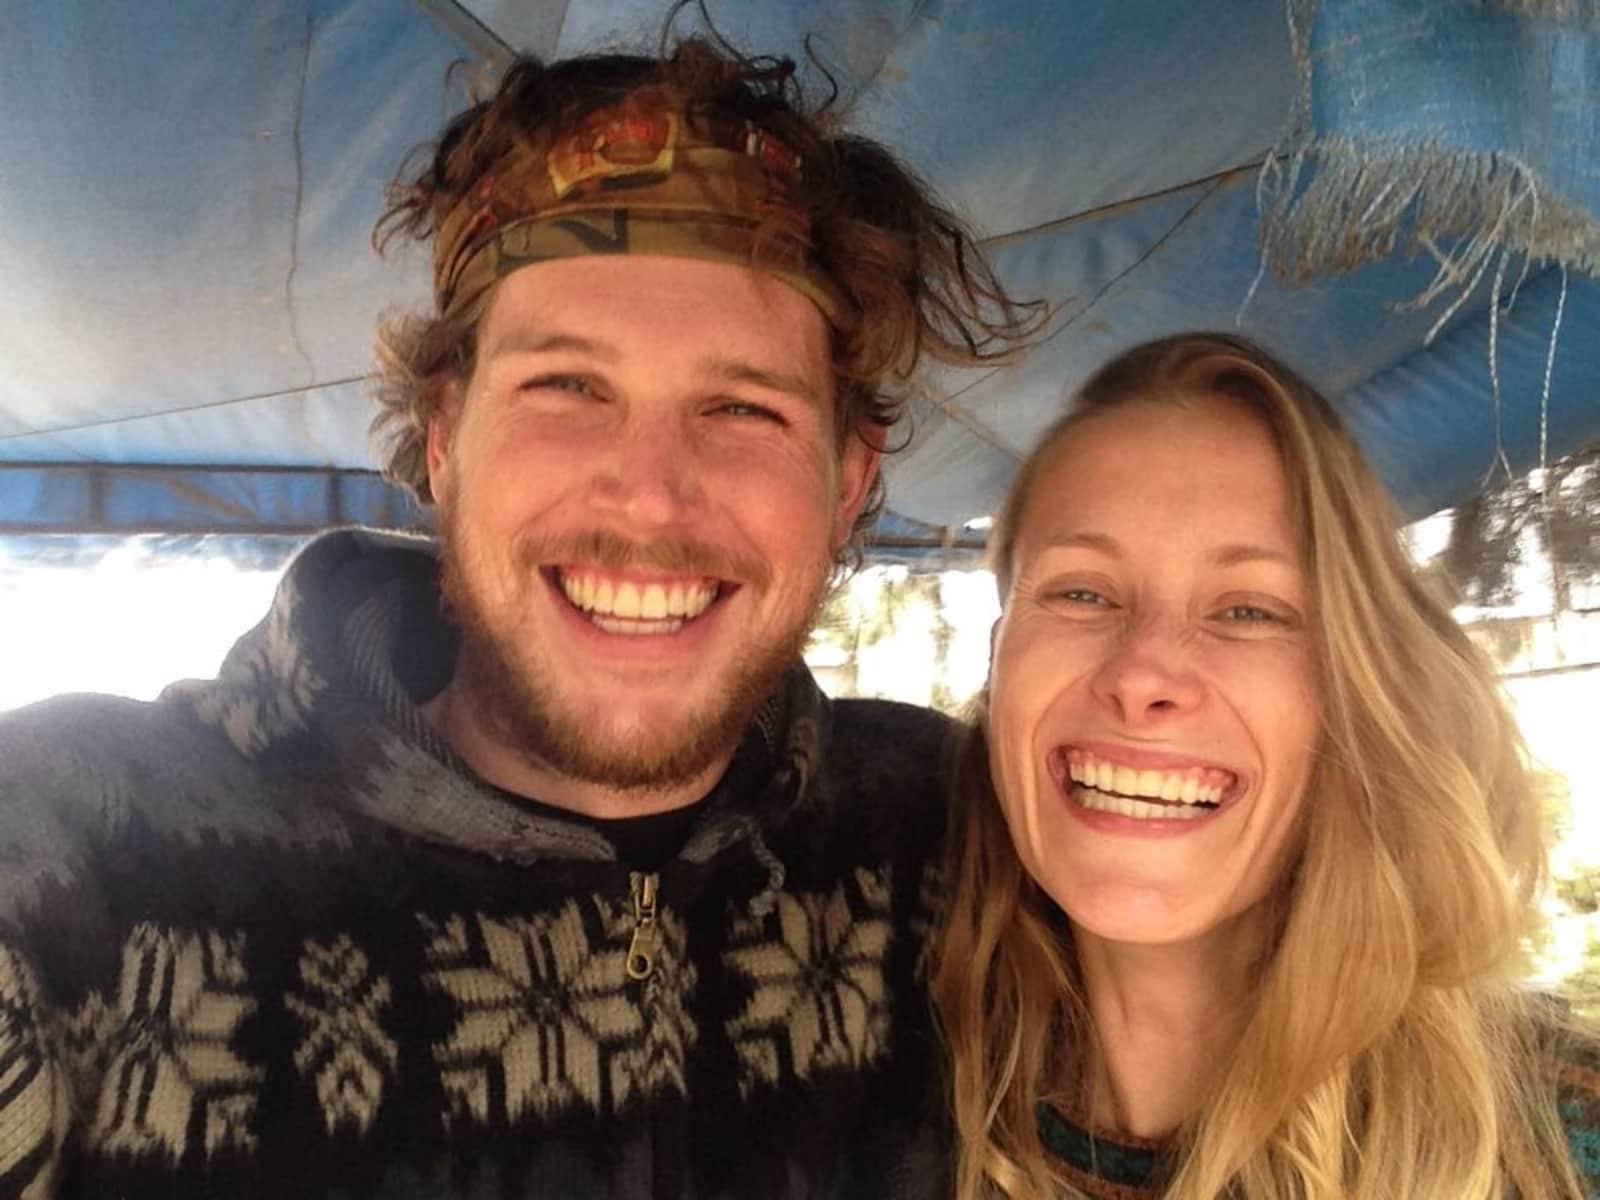 Julia & Mark from Newcastle, New South Wales, Australia